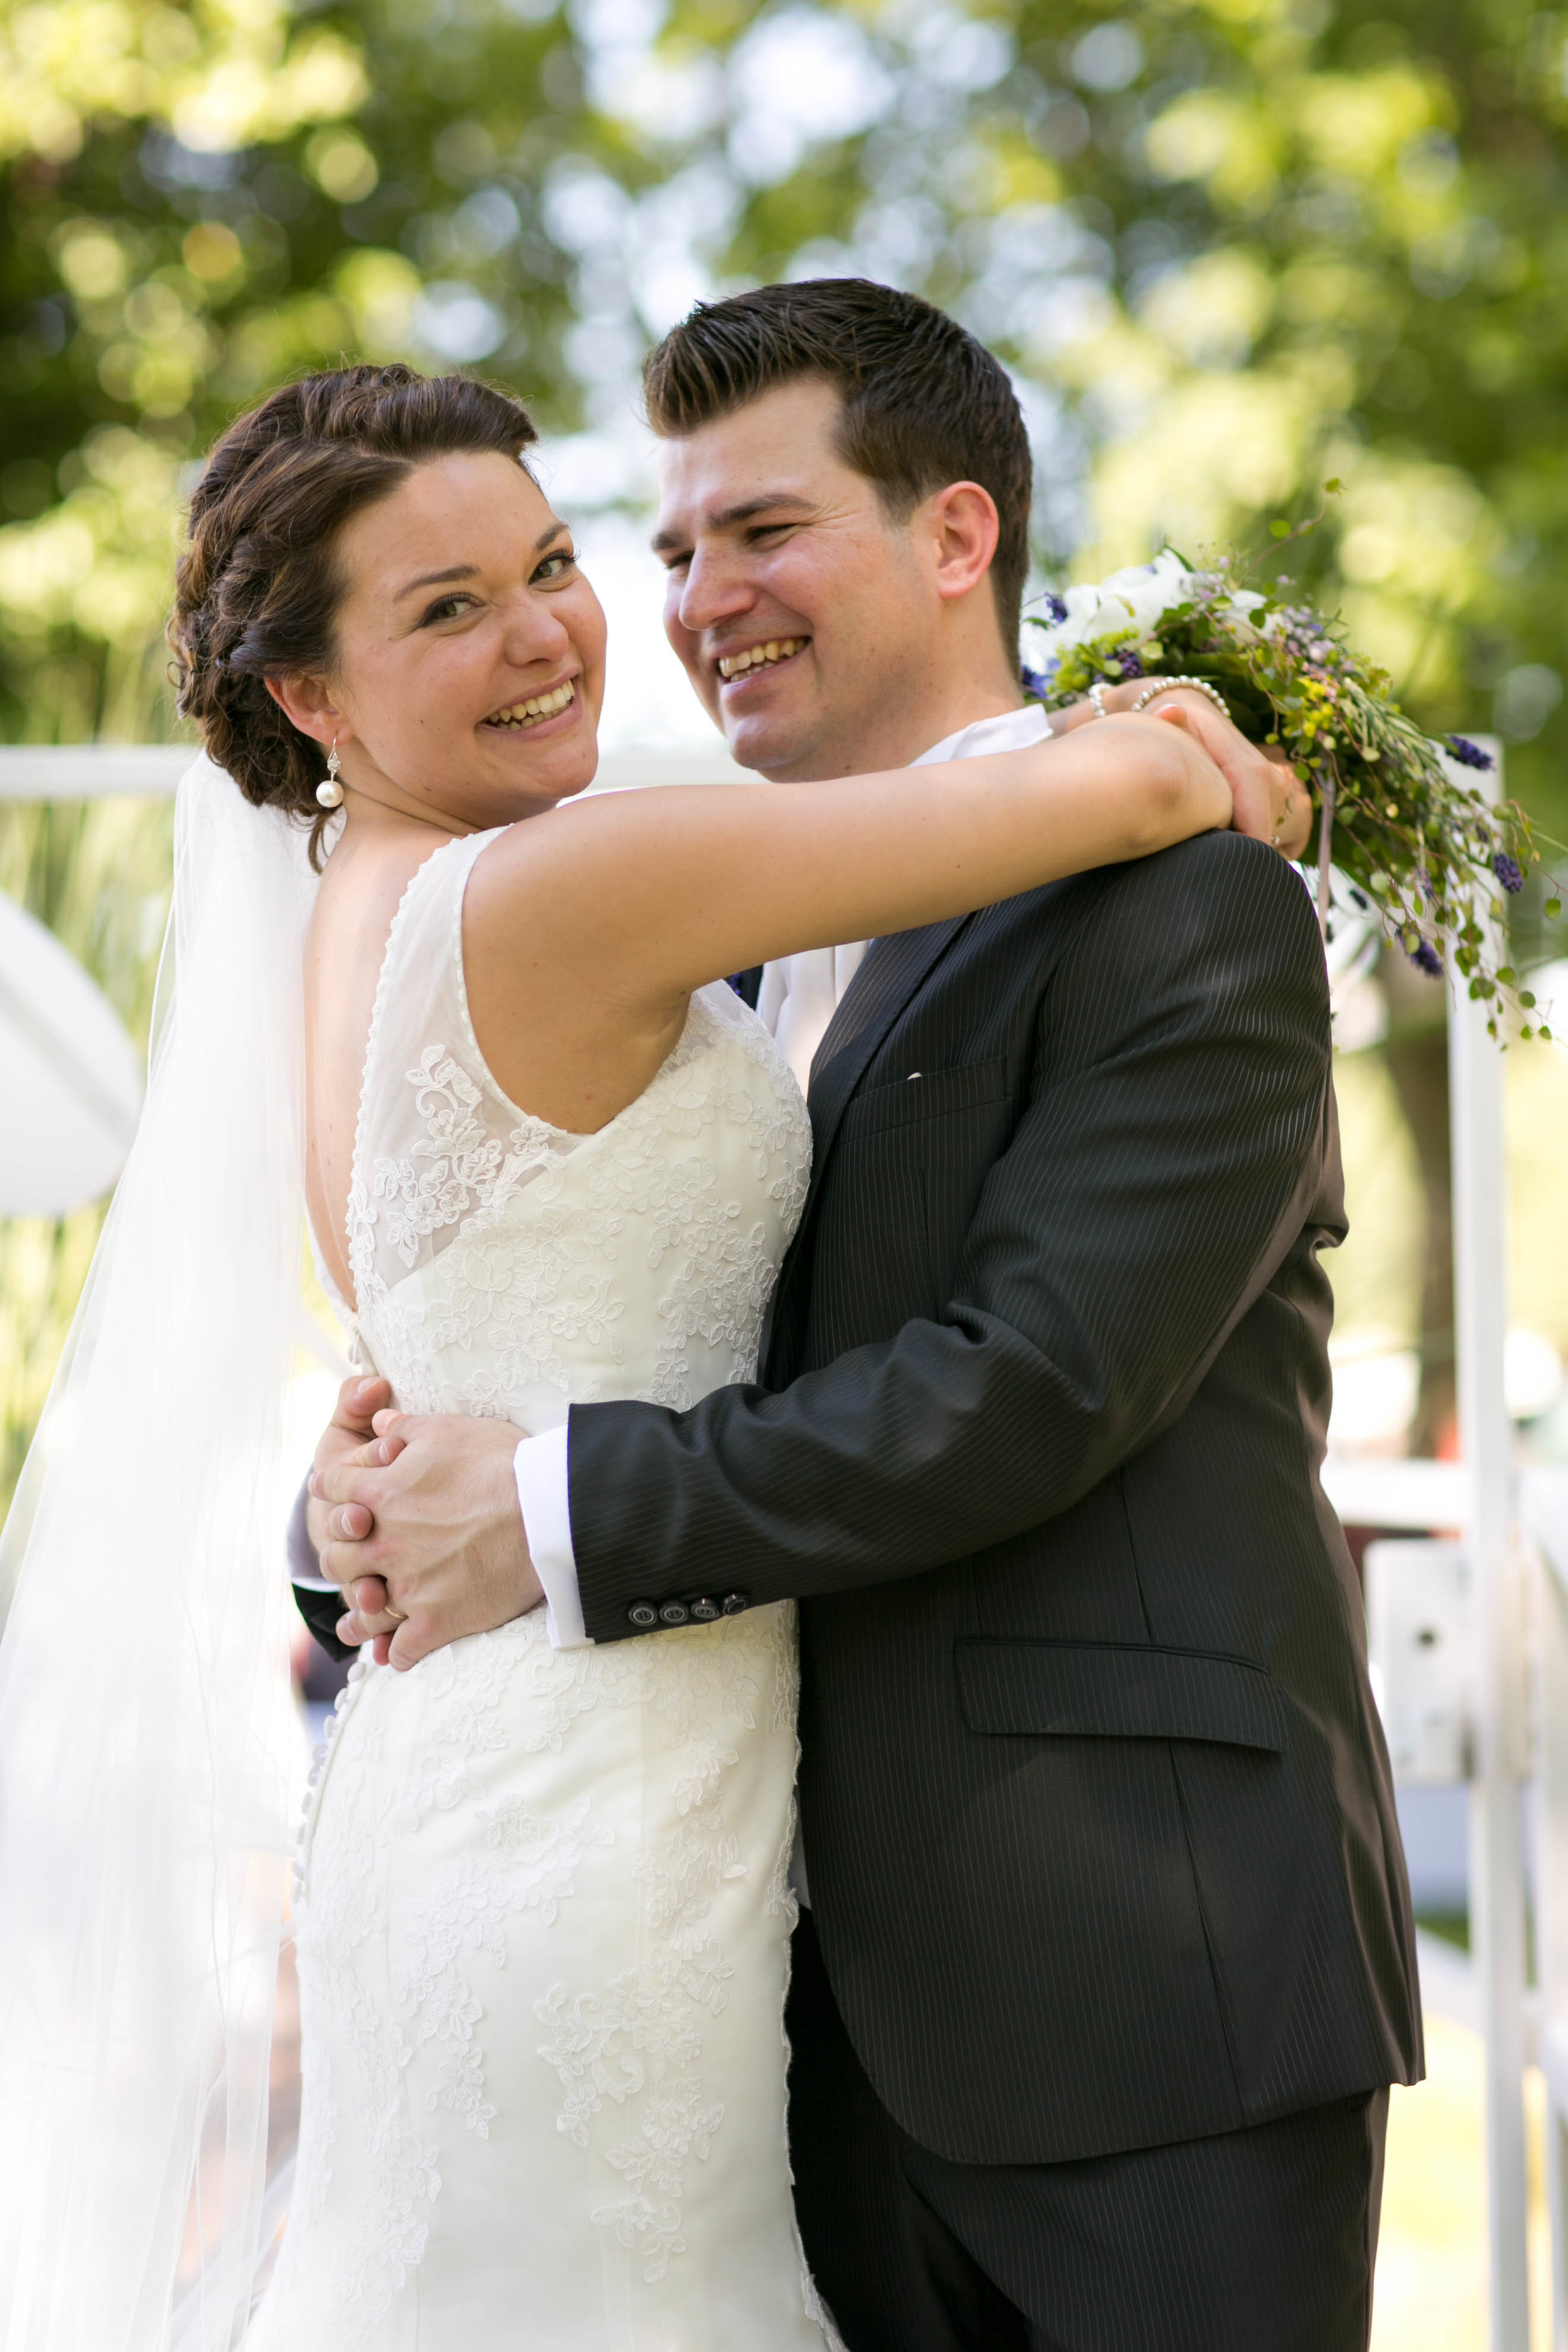 Hochzeitsfotografie Berlin_Fran Burrows Fotografie-210.jpg